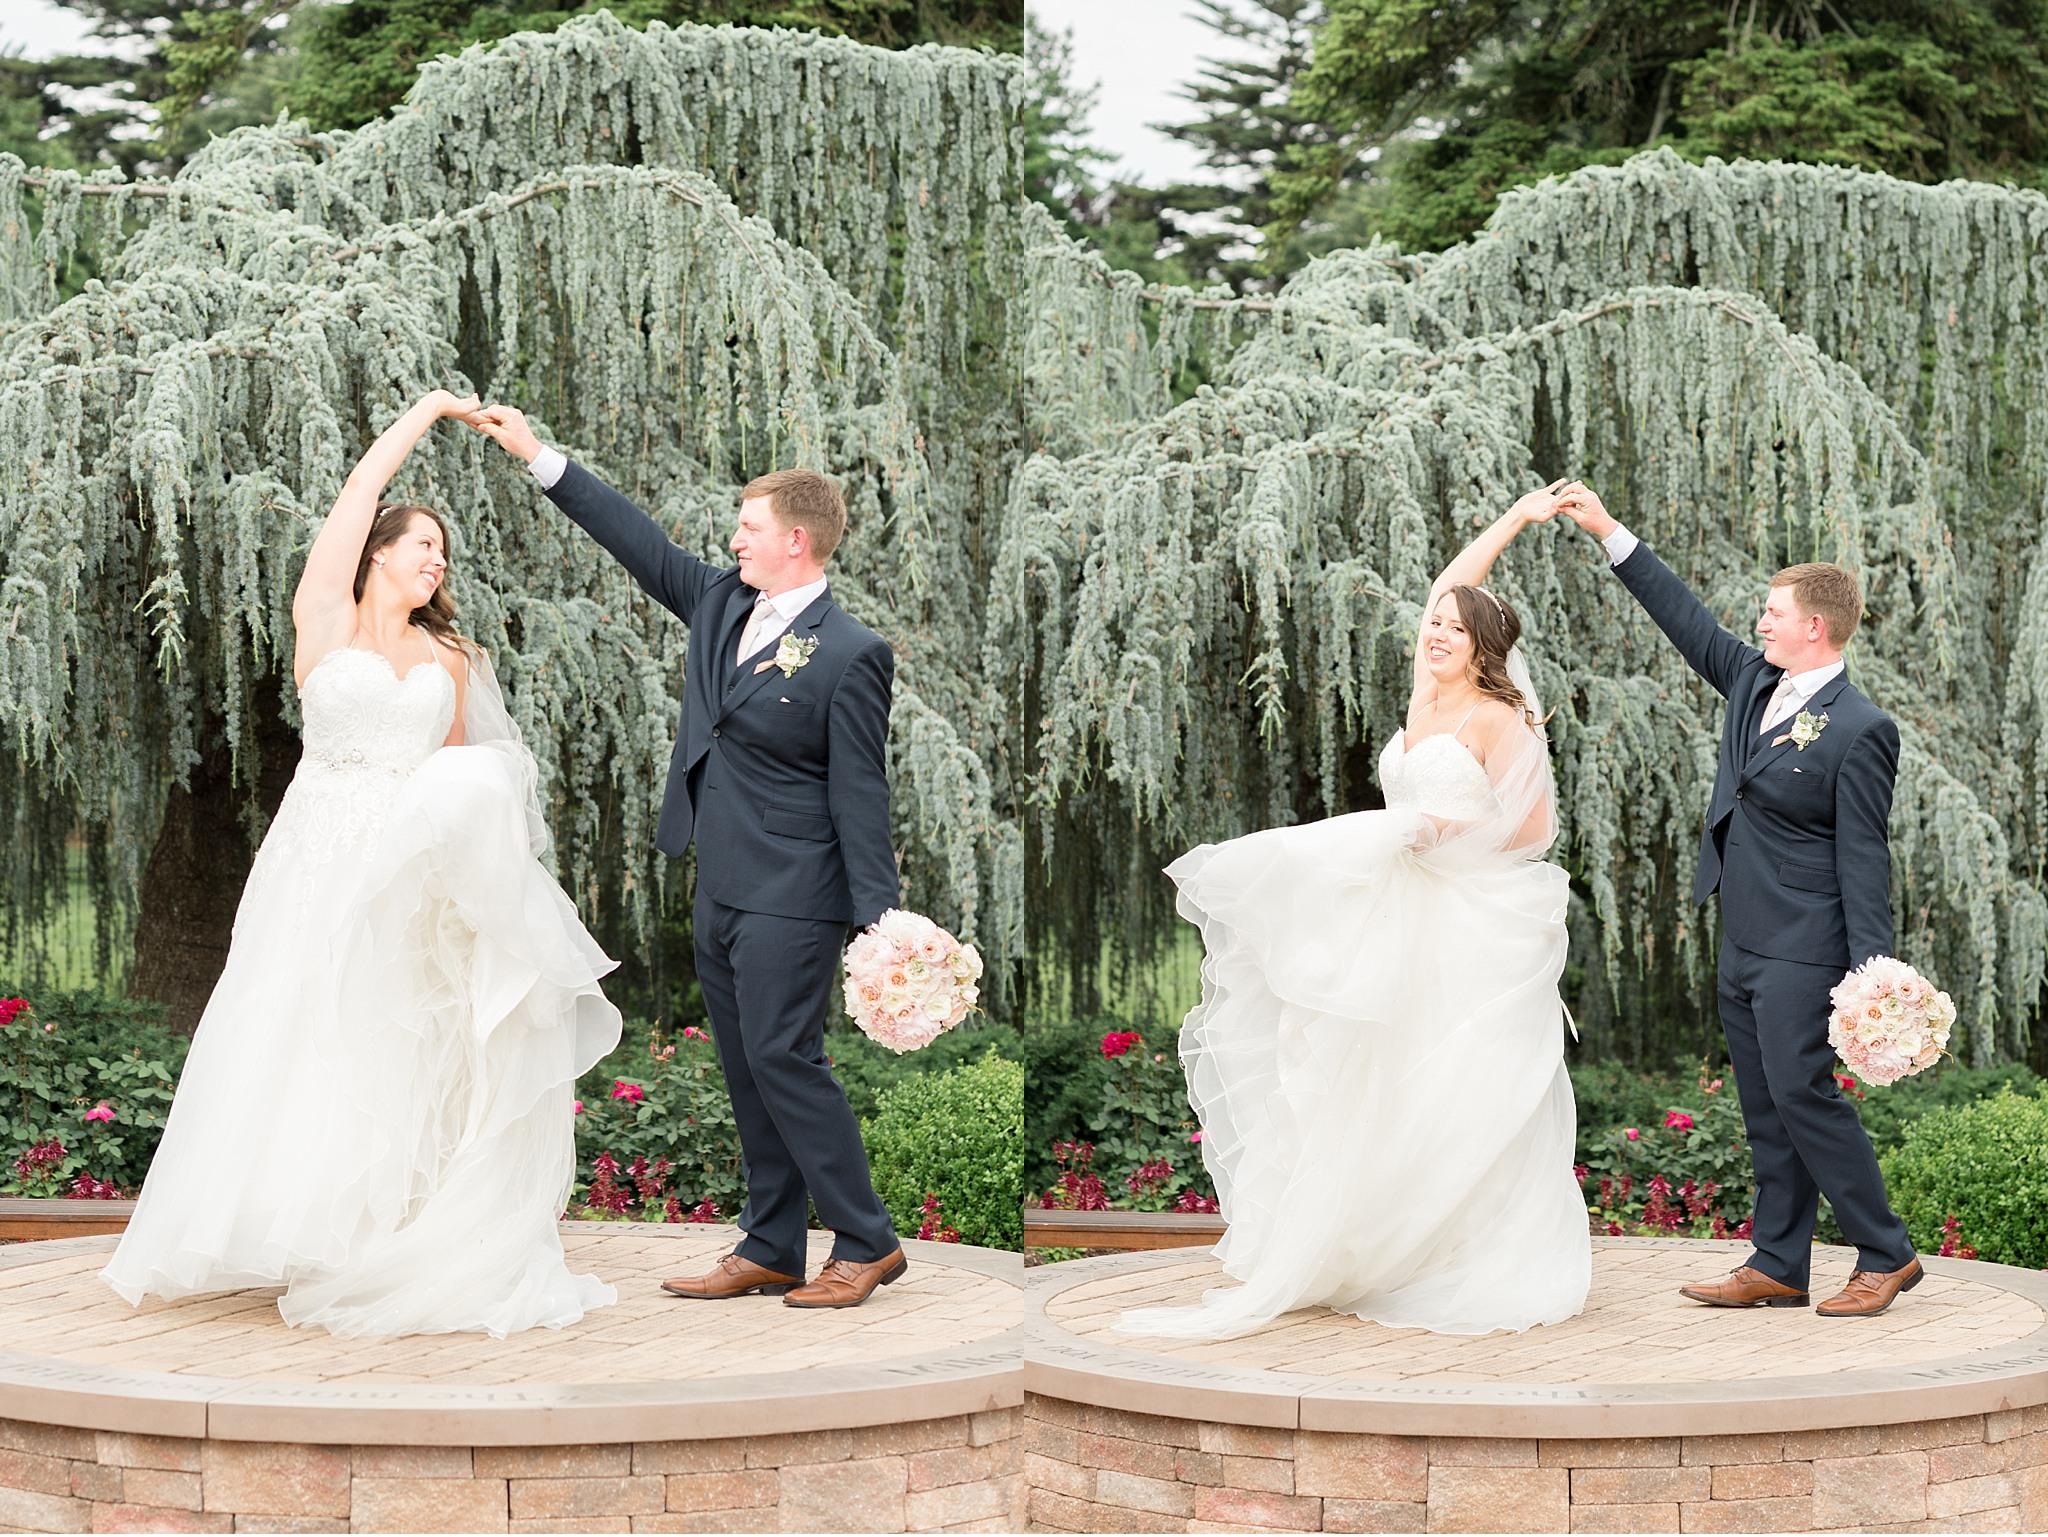 Bride and groom Twirling Hershey Gardens Hershey Country Club Summer beautiful wedding photography_1601.jpg